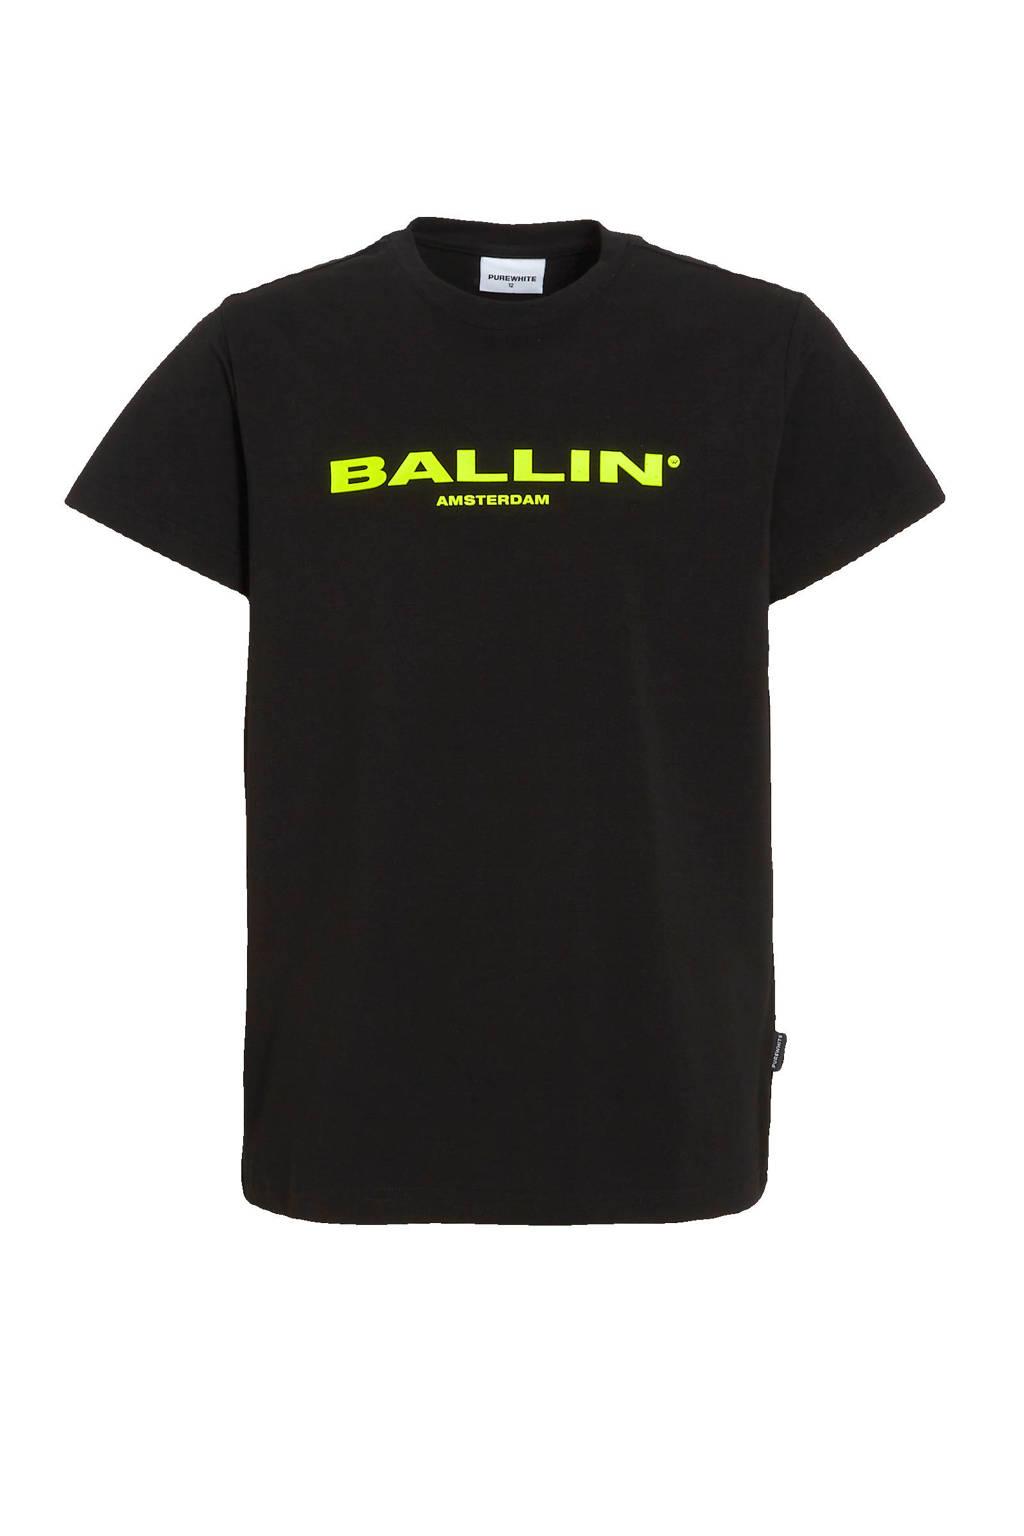 Ballin T-shirt met logo zwart/neon groen